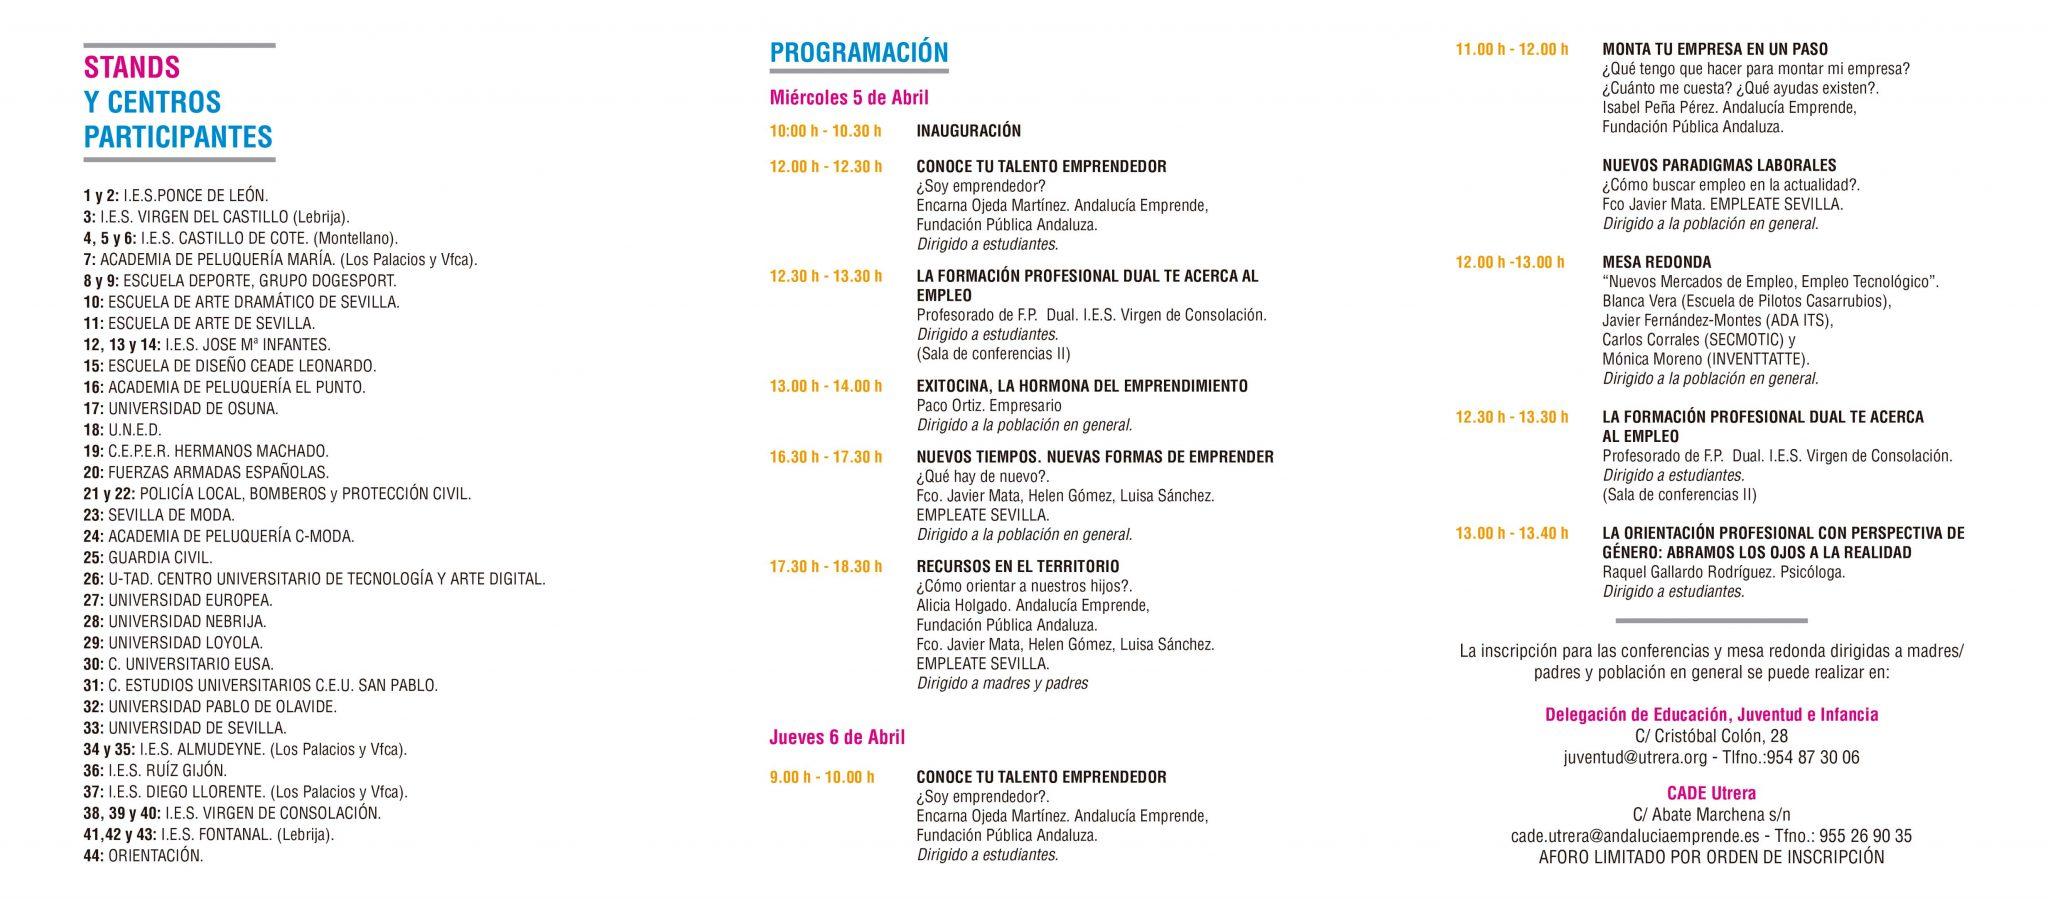 Jornadas de Orientacion academica profesional - Programacion Interior - Utrera Sevilla